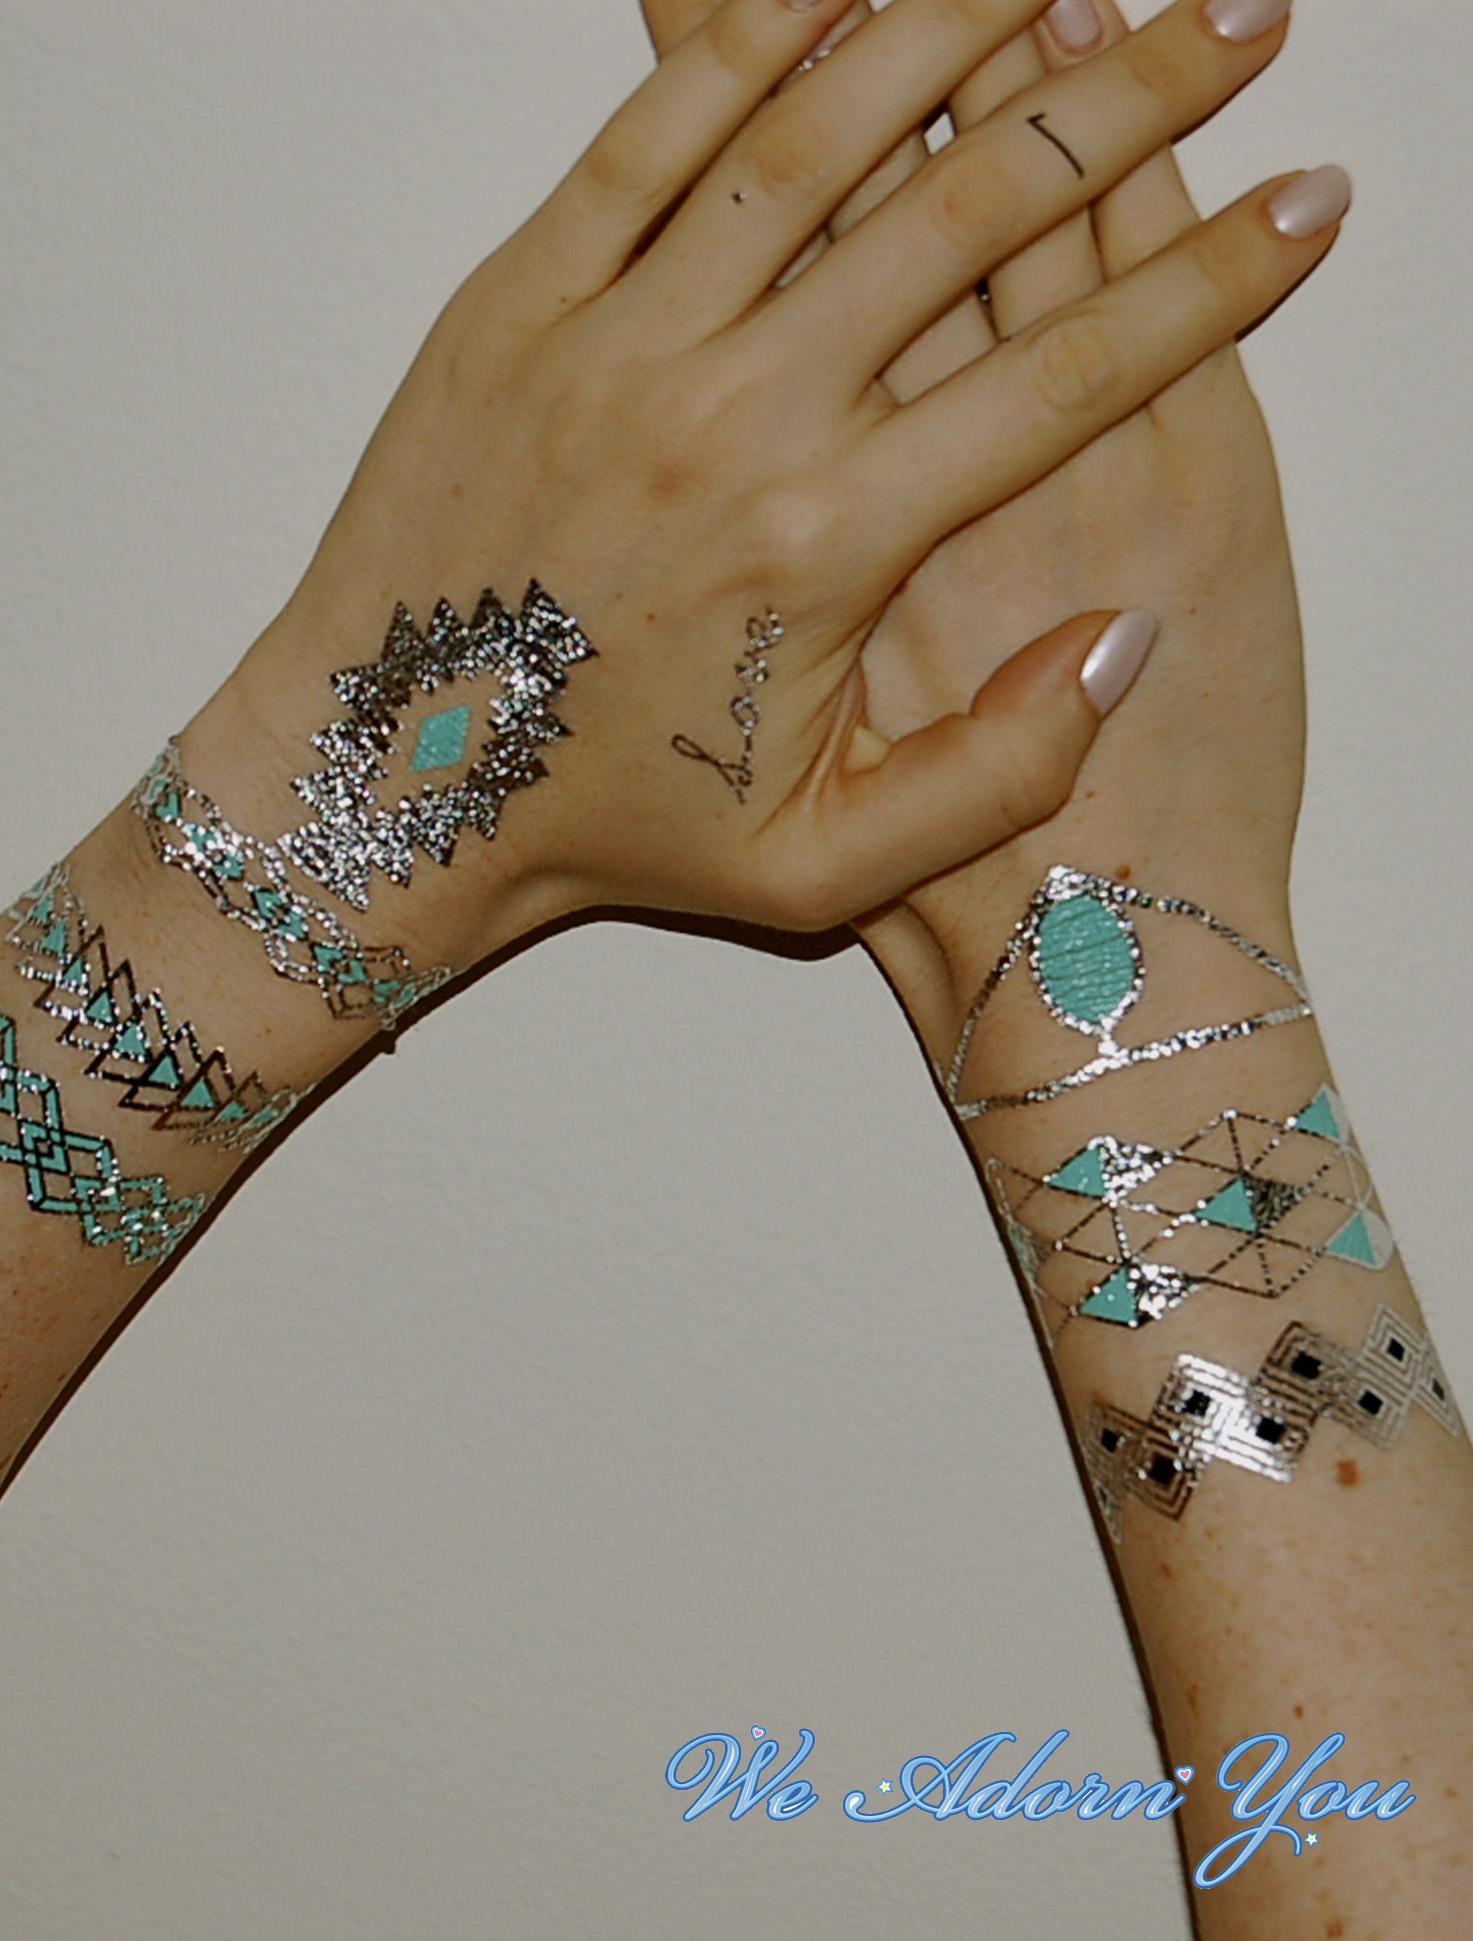 Flash Tattoo Geo - We Adorn You.jpg